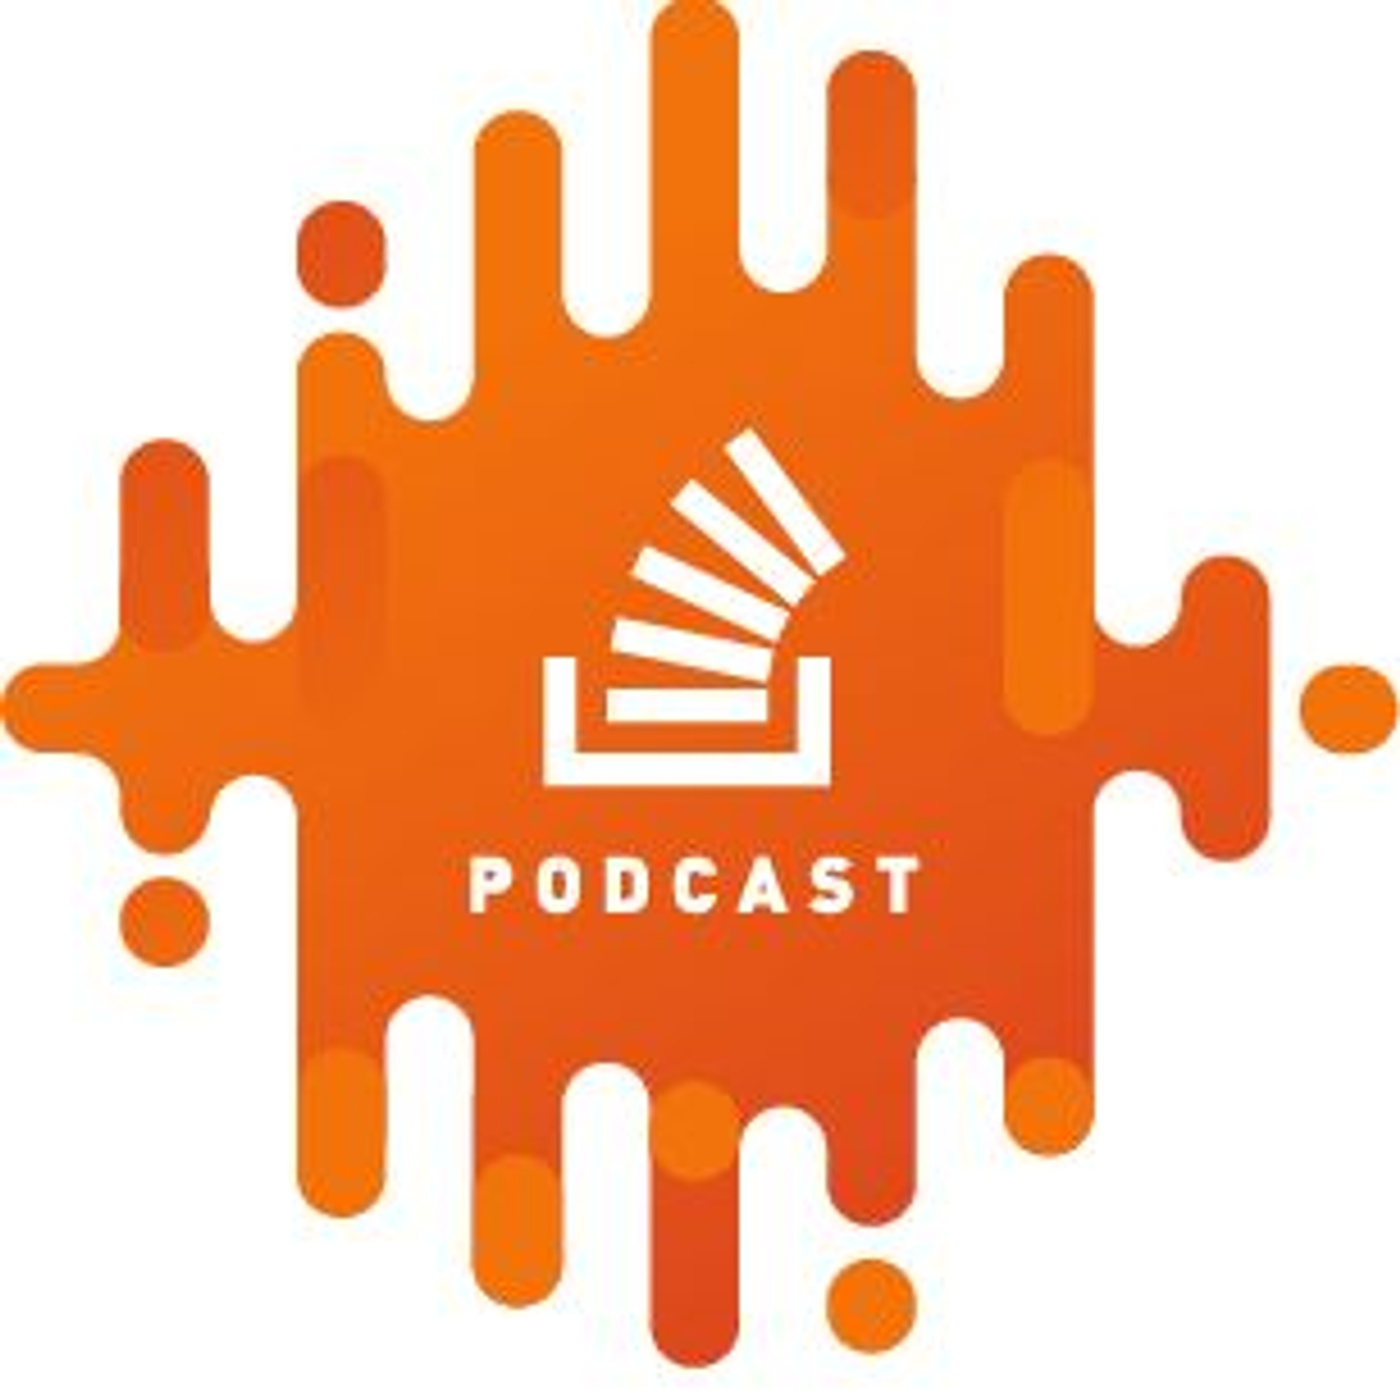 Podcast #120 - Halloween Spooktacular with Anil Slash